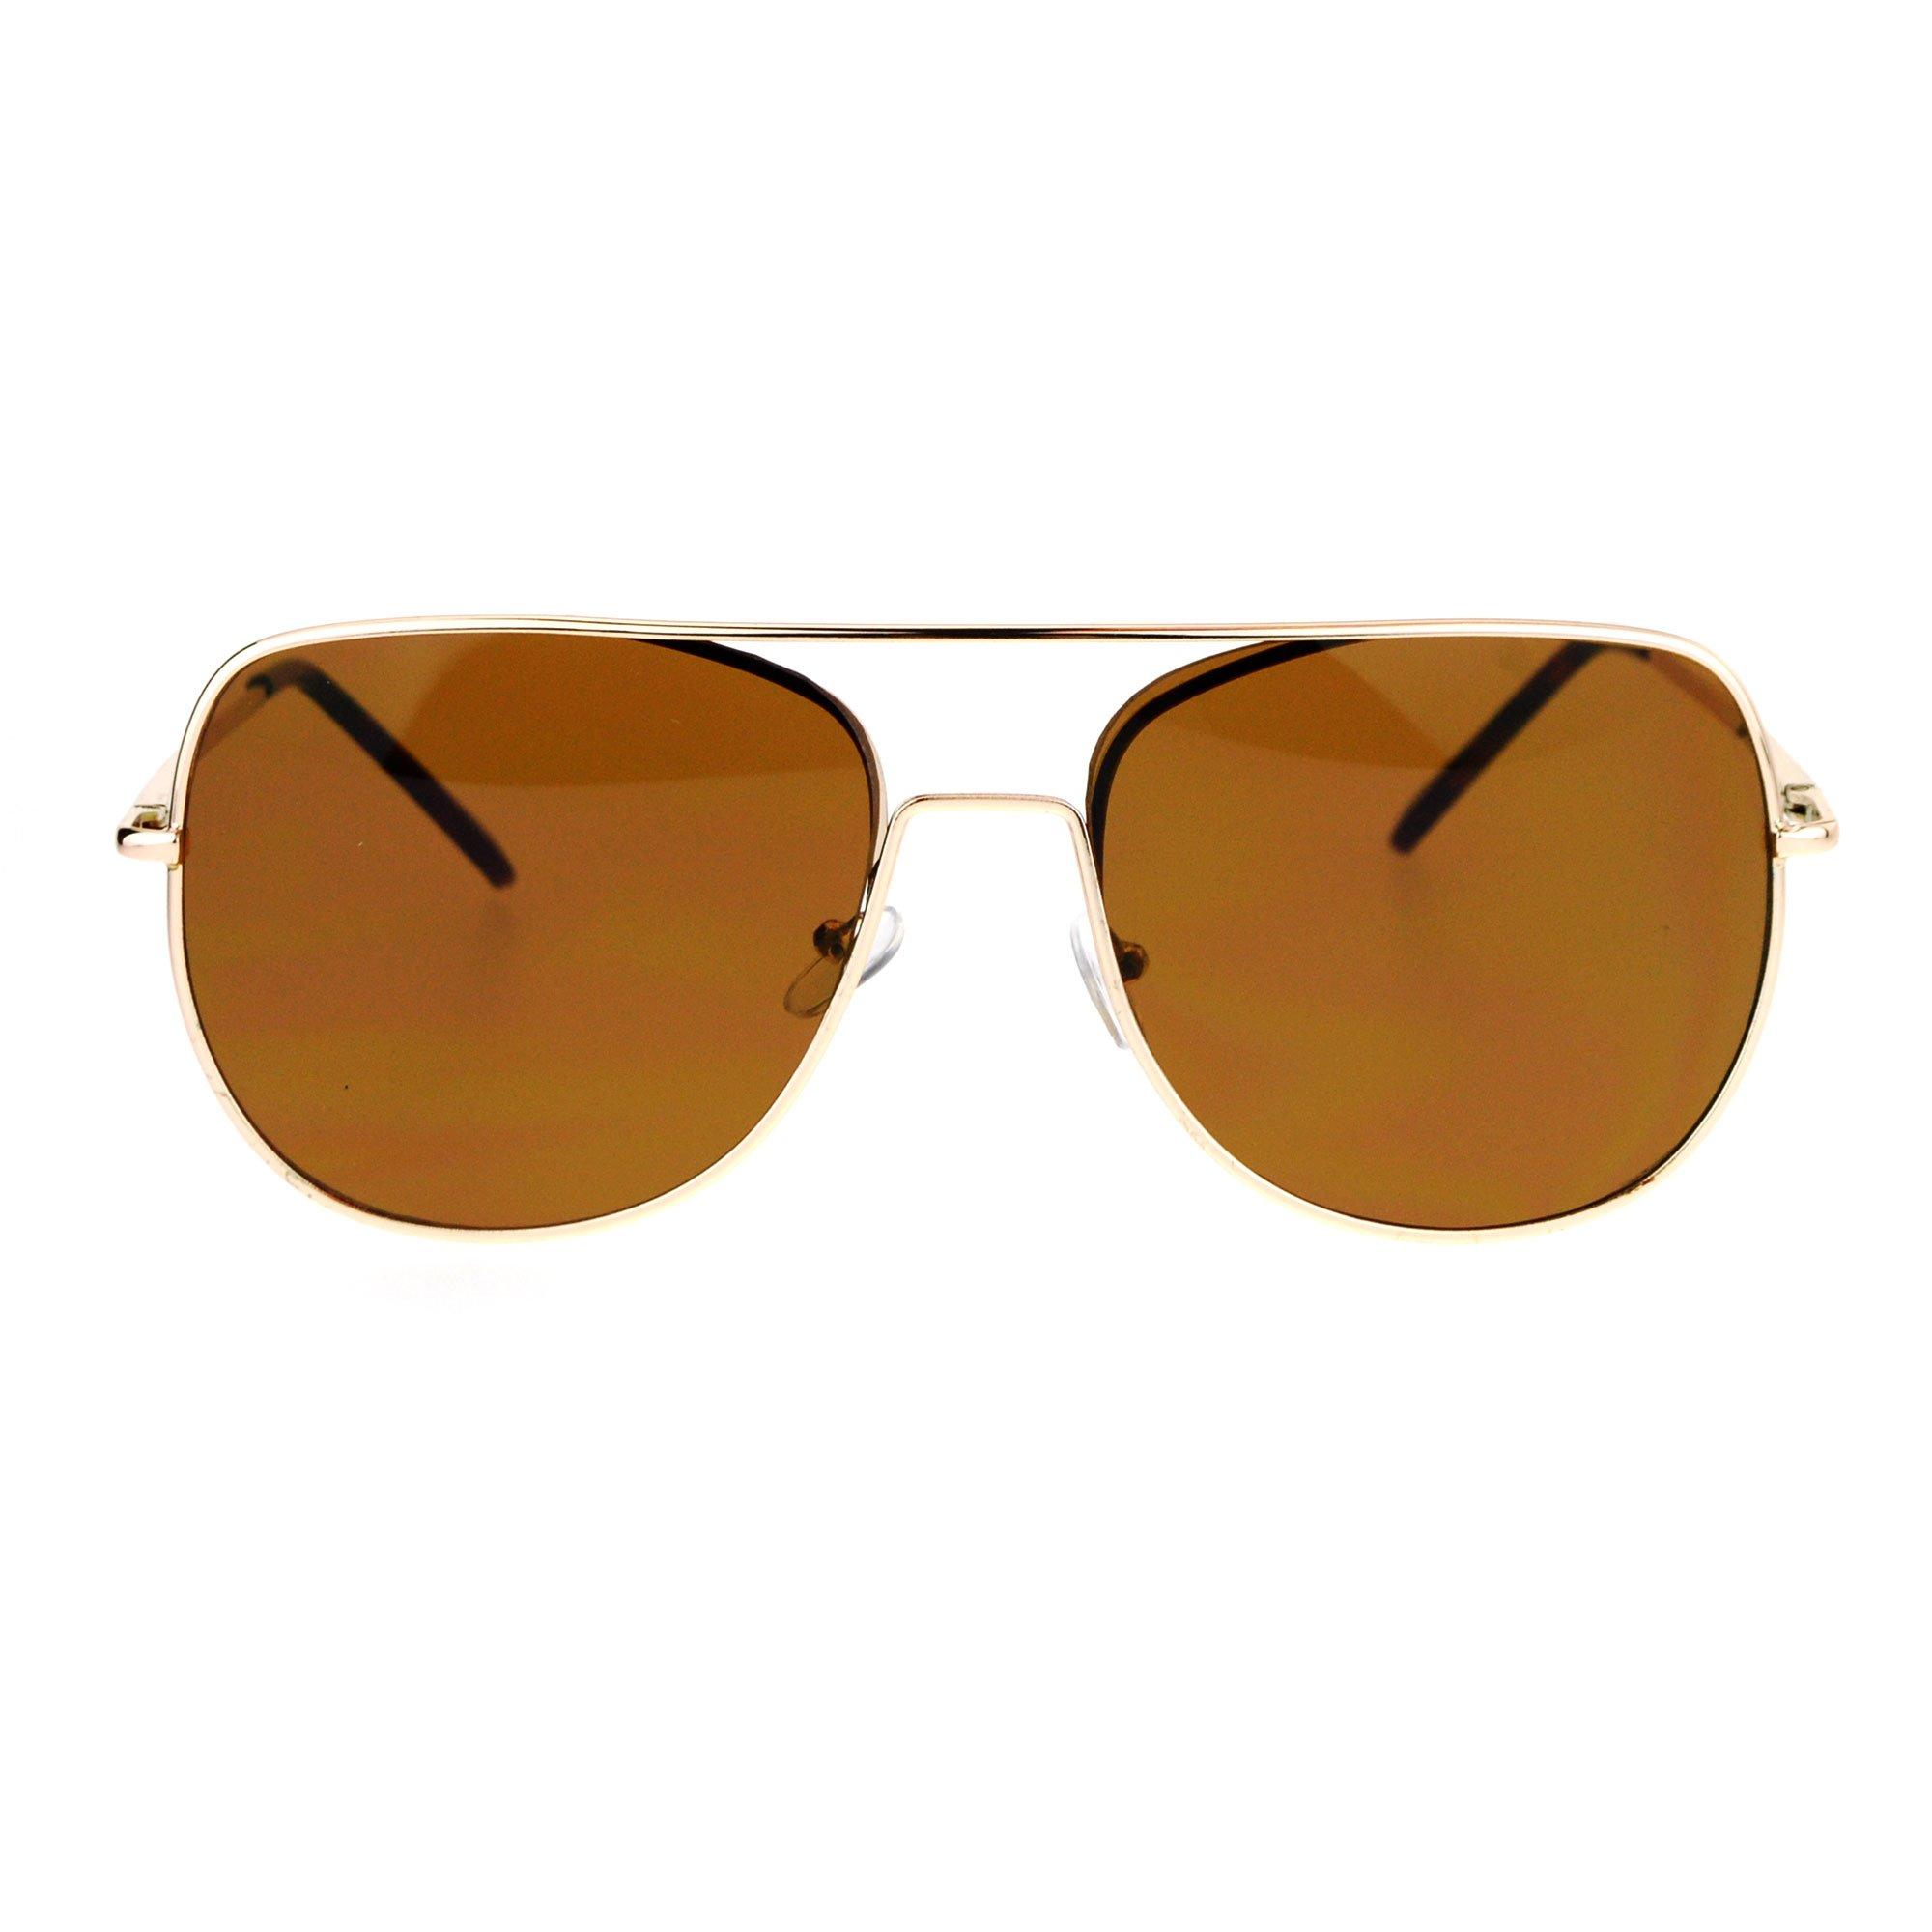 SA106 Mens Expose Lens Unique Flat Top Metal Pilot Sunglasses Gold Brown by SA106